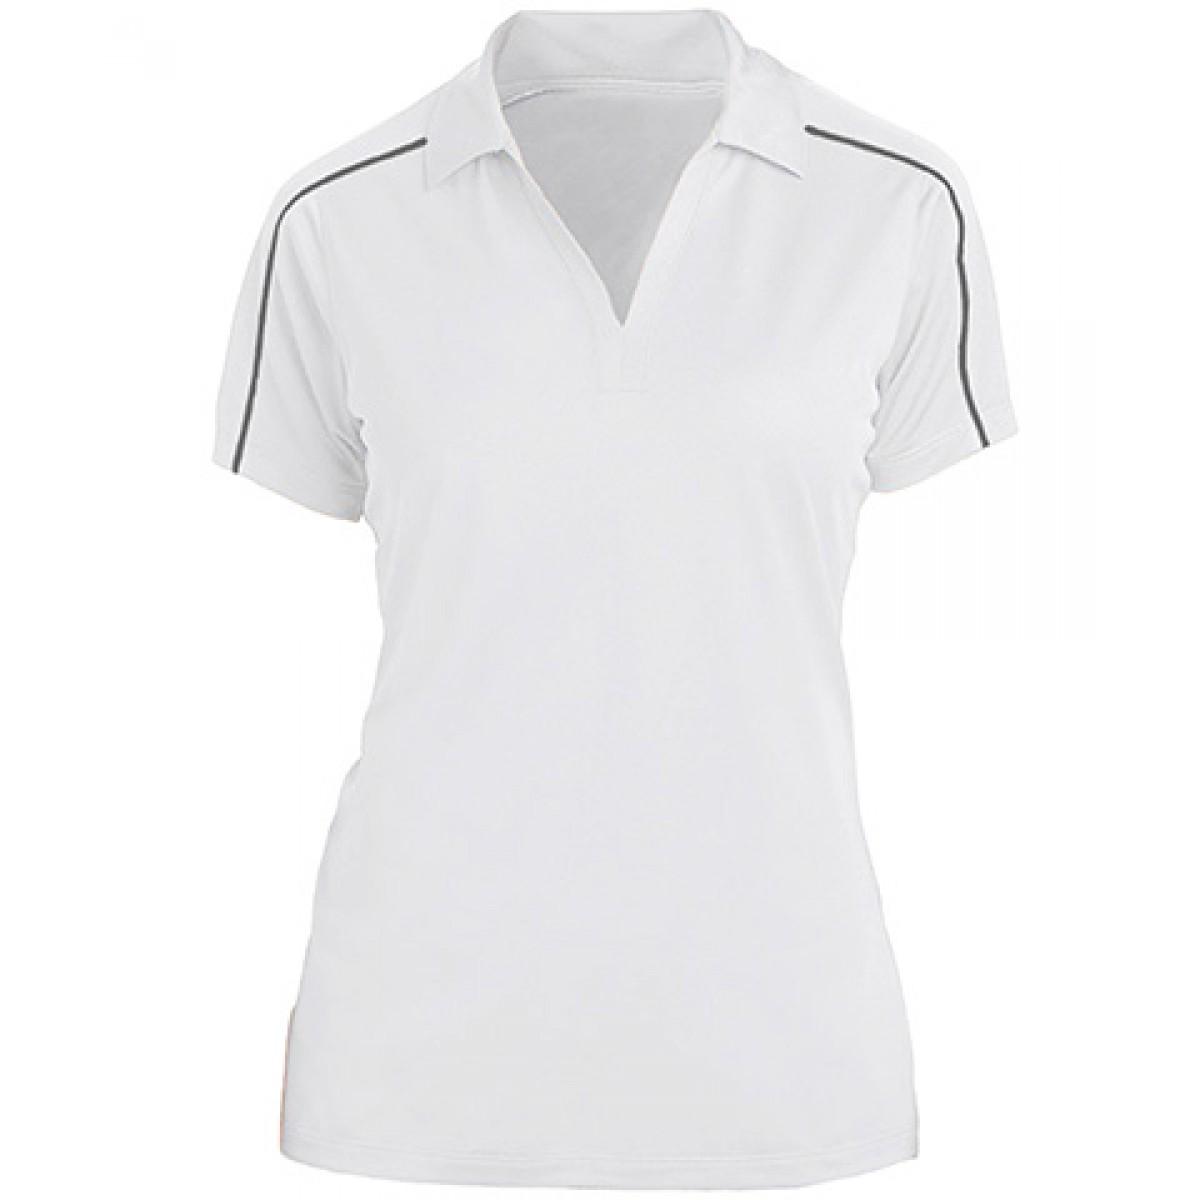 Sport-Tek Womens Piped Short Sleeve Polo -White-L